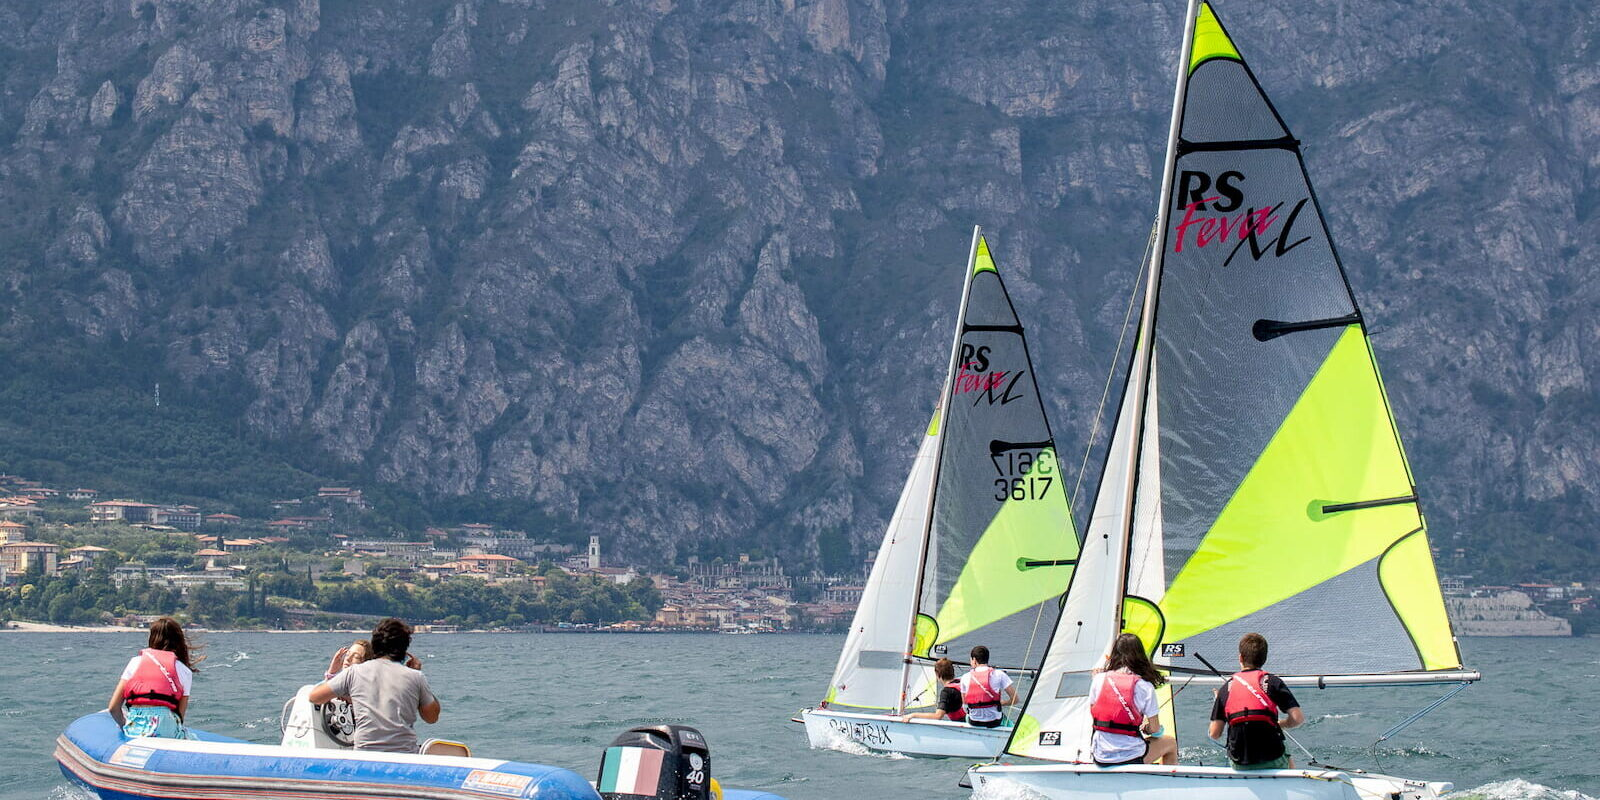 Corso Vela Ragazzi a Malcesine, Lago di Garda Fraglia Vela Malcesine